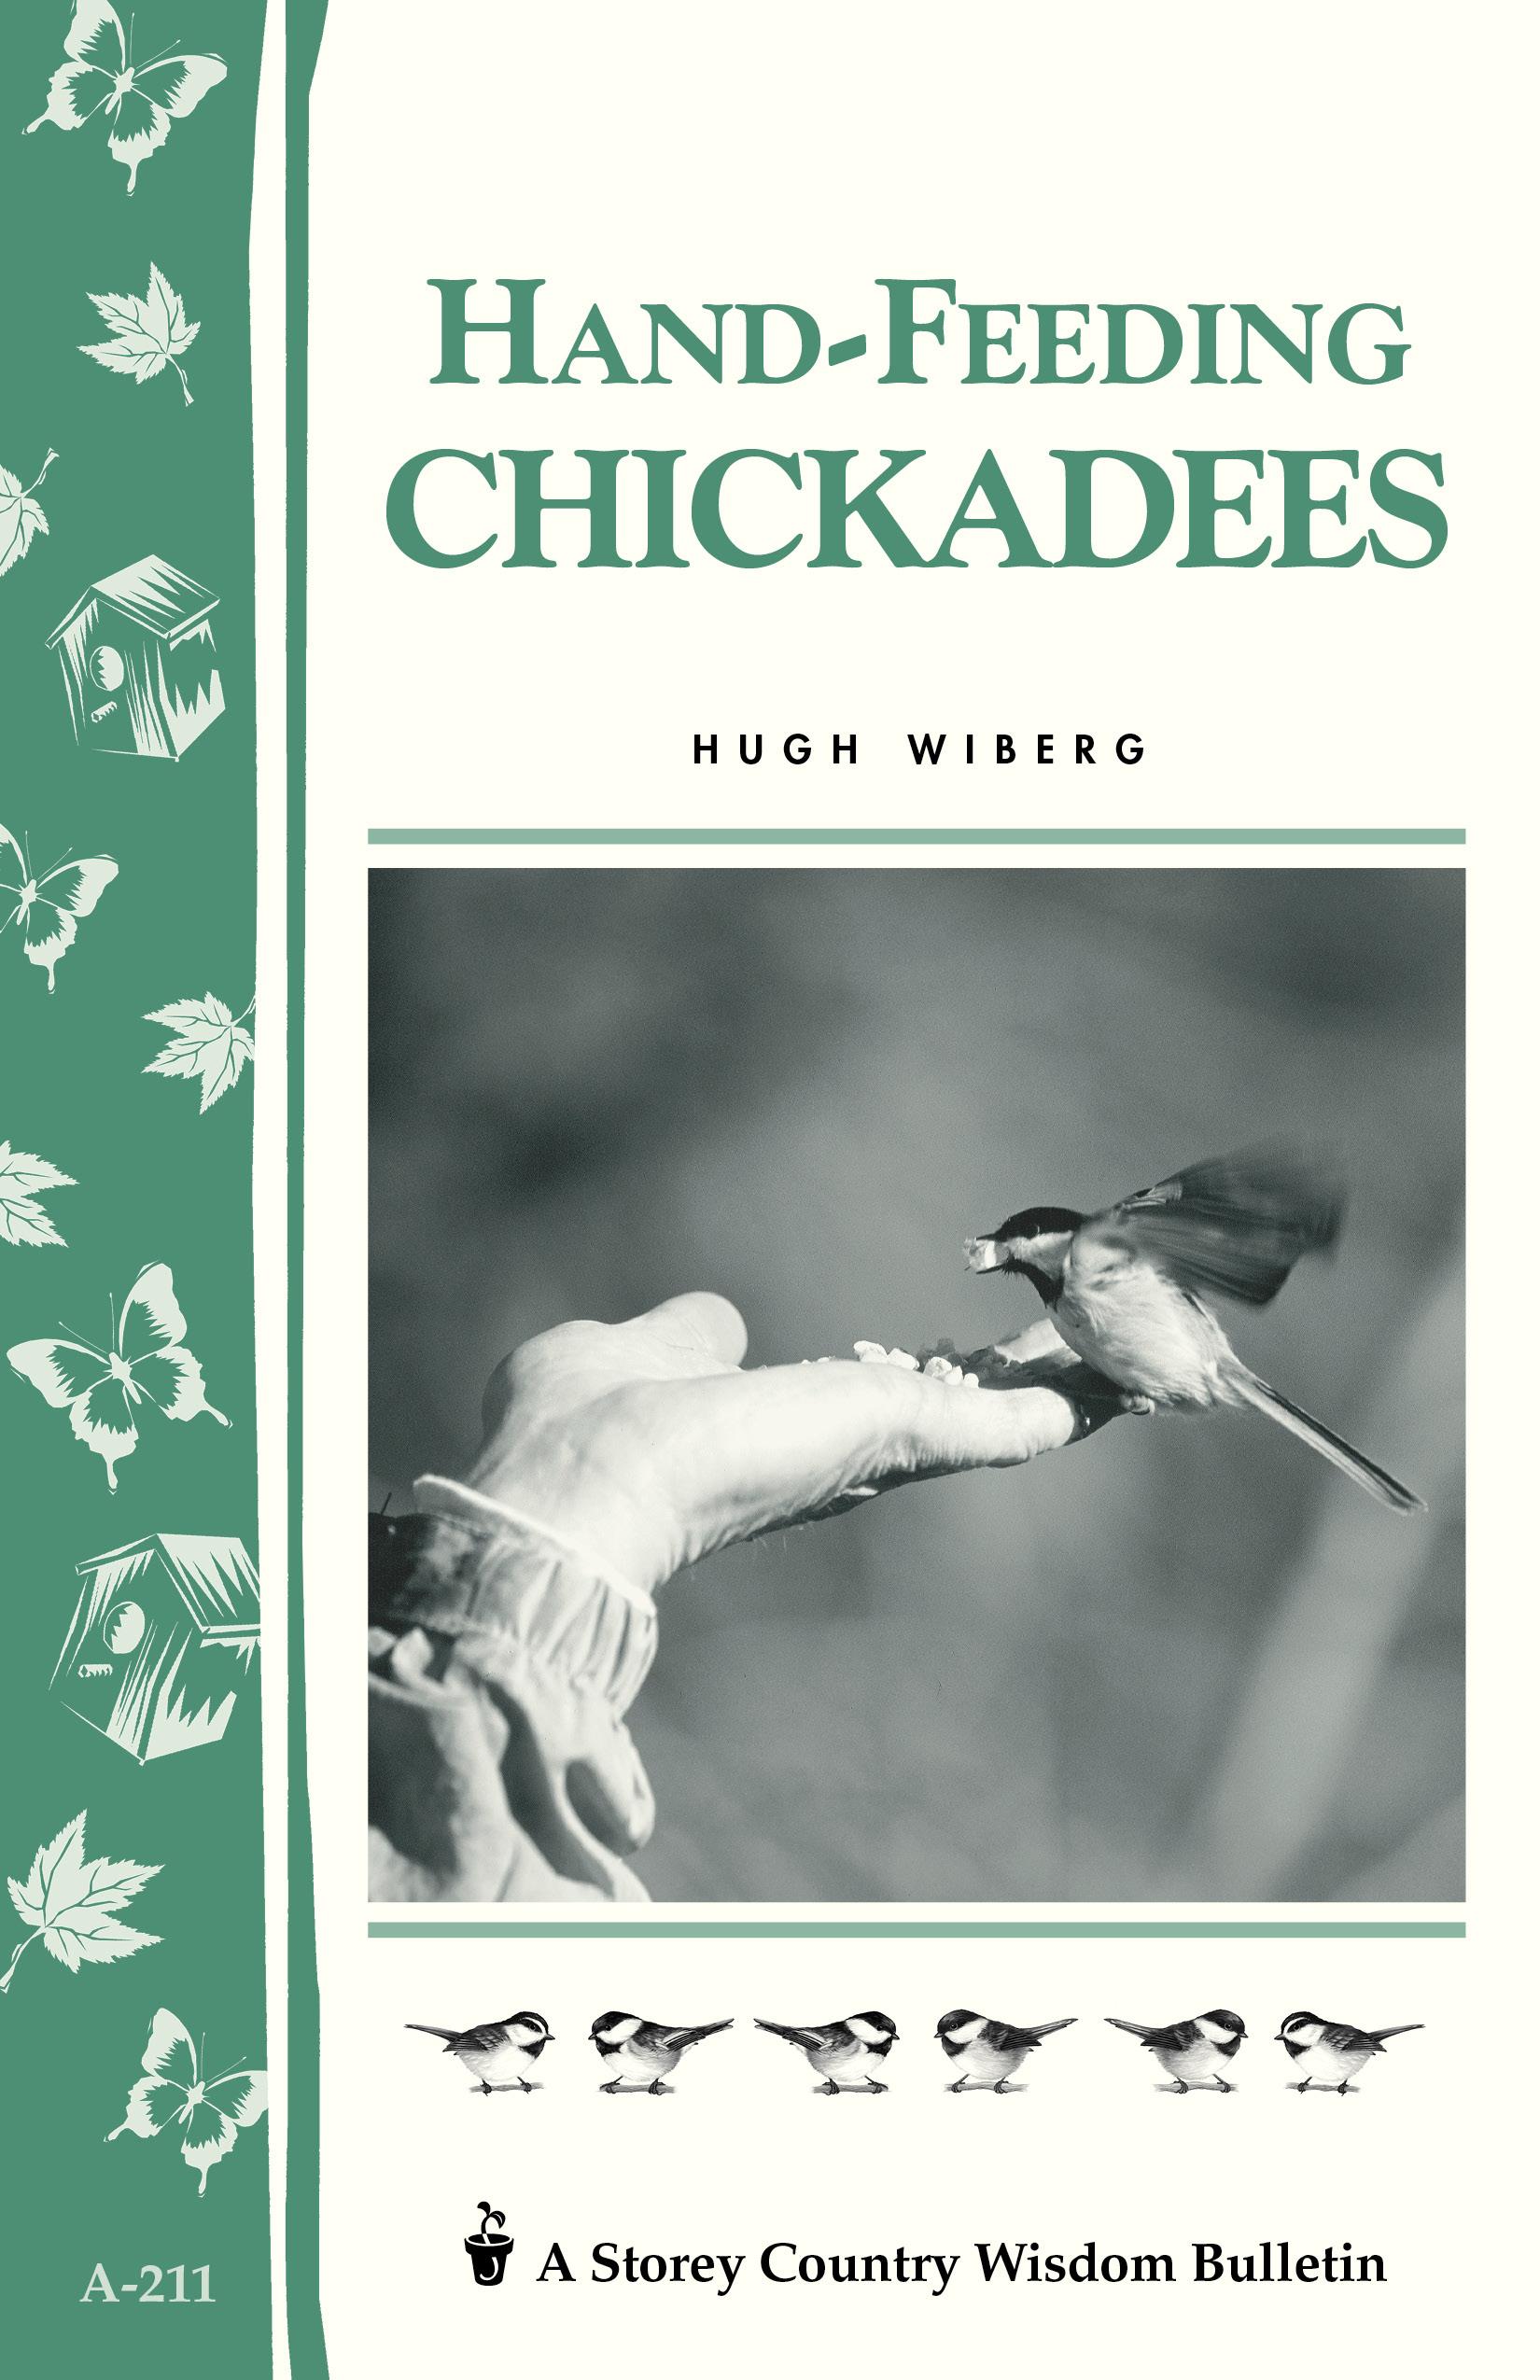 Hand-Feeding Chickadees Storey's Country Wisdom Bulletin A-211 - Hugh Wiberg